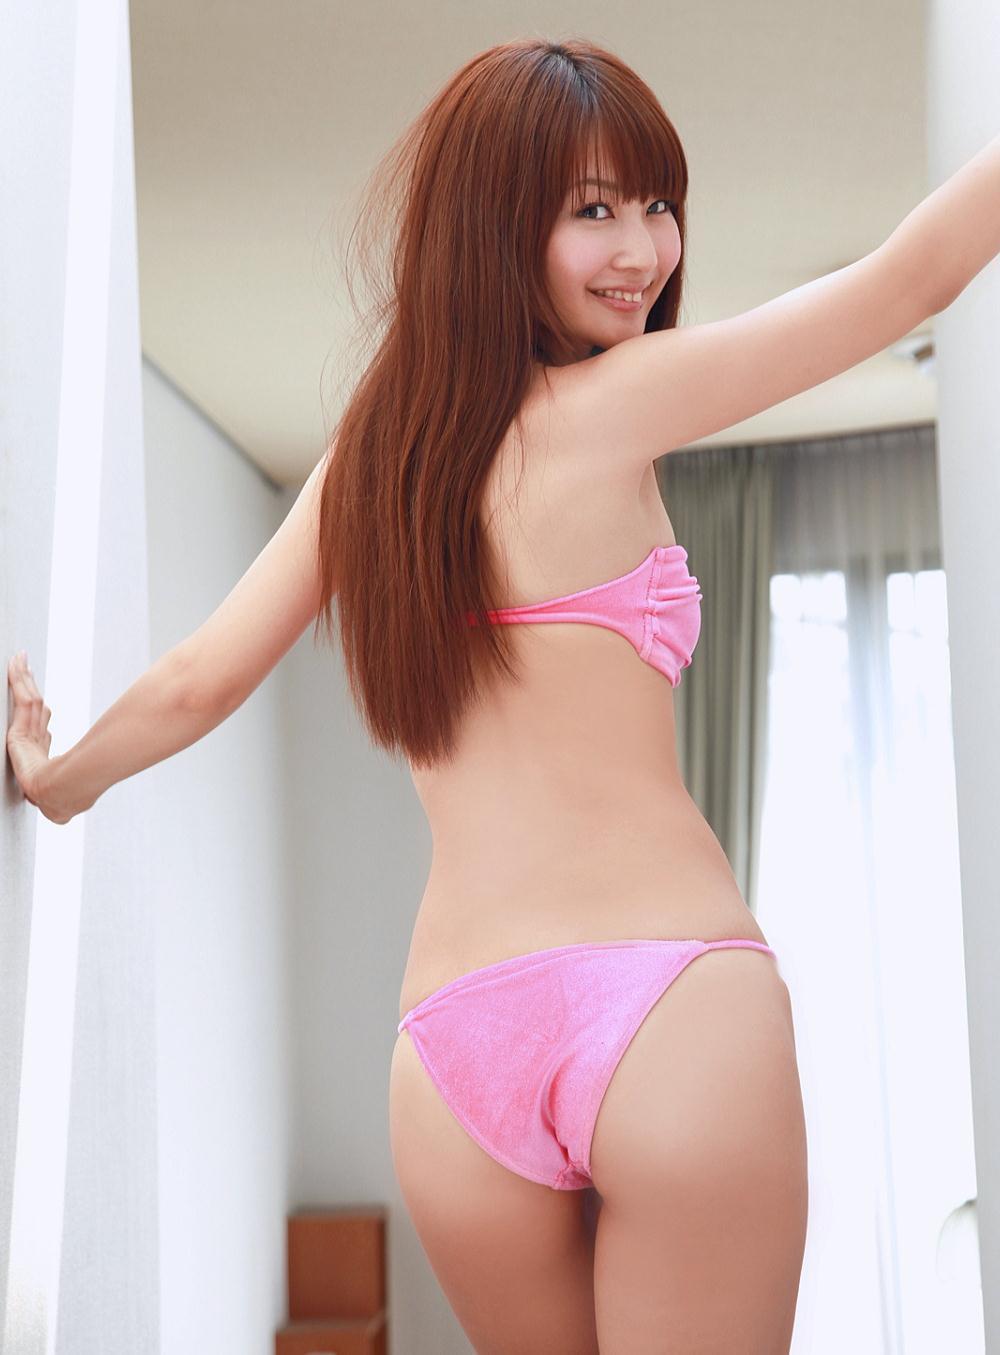 upskirt slideshow with no panties  xxxbunkercom porn tube